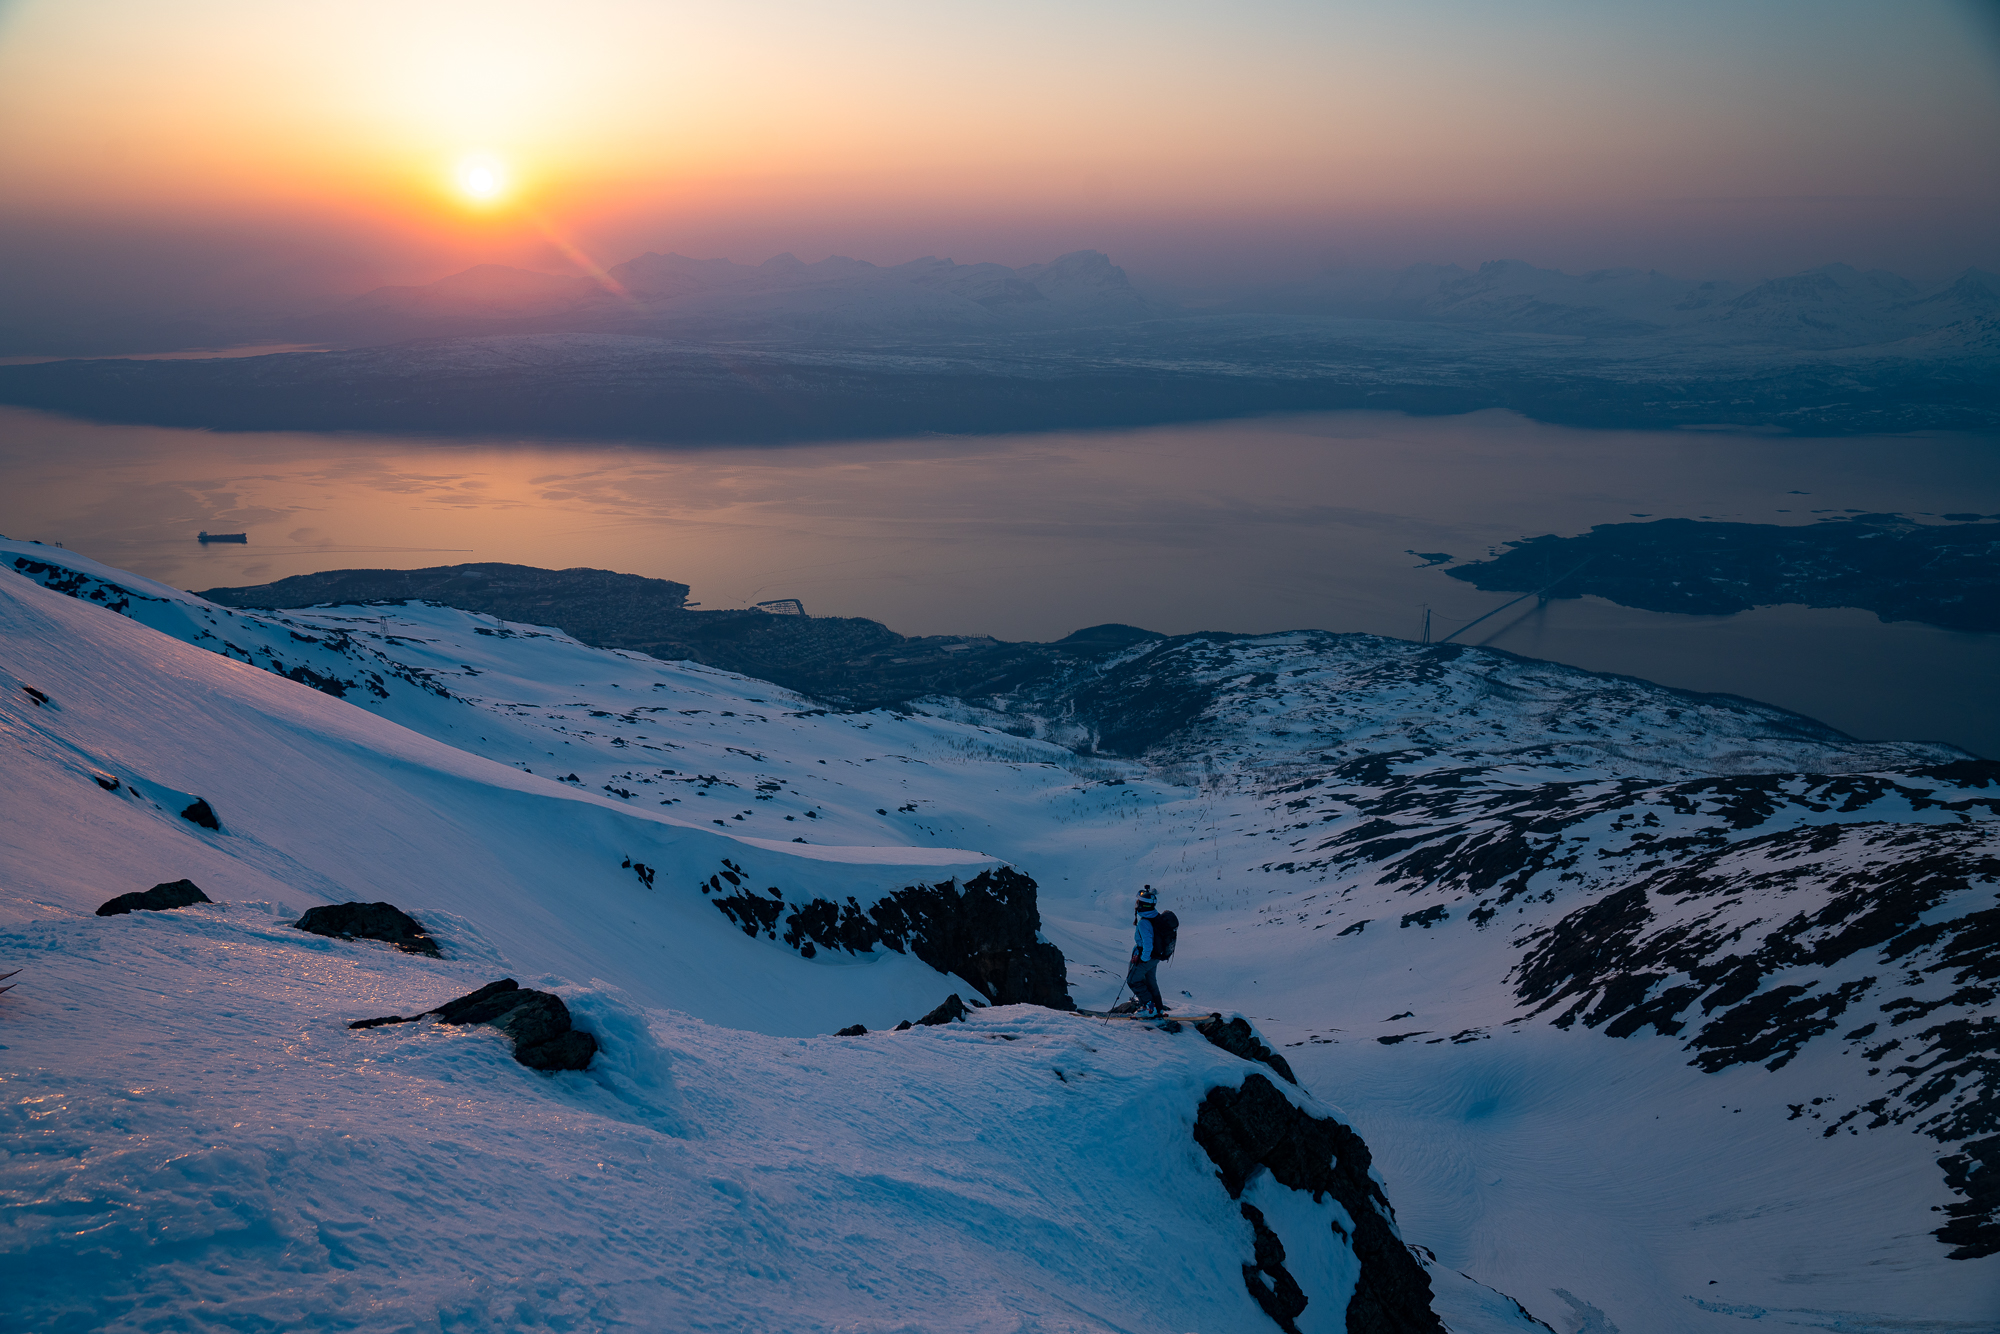 190426_Narvik_dag11_KyrreBuxrud_4.jpg